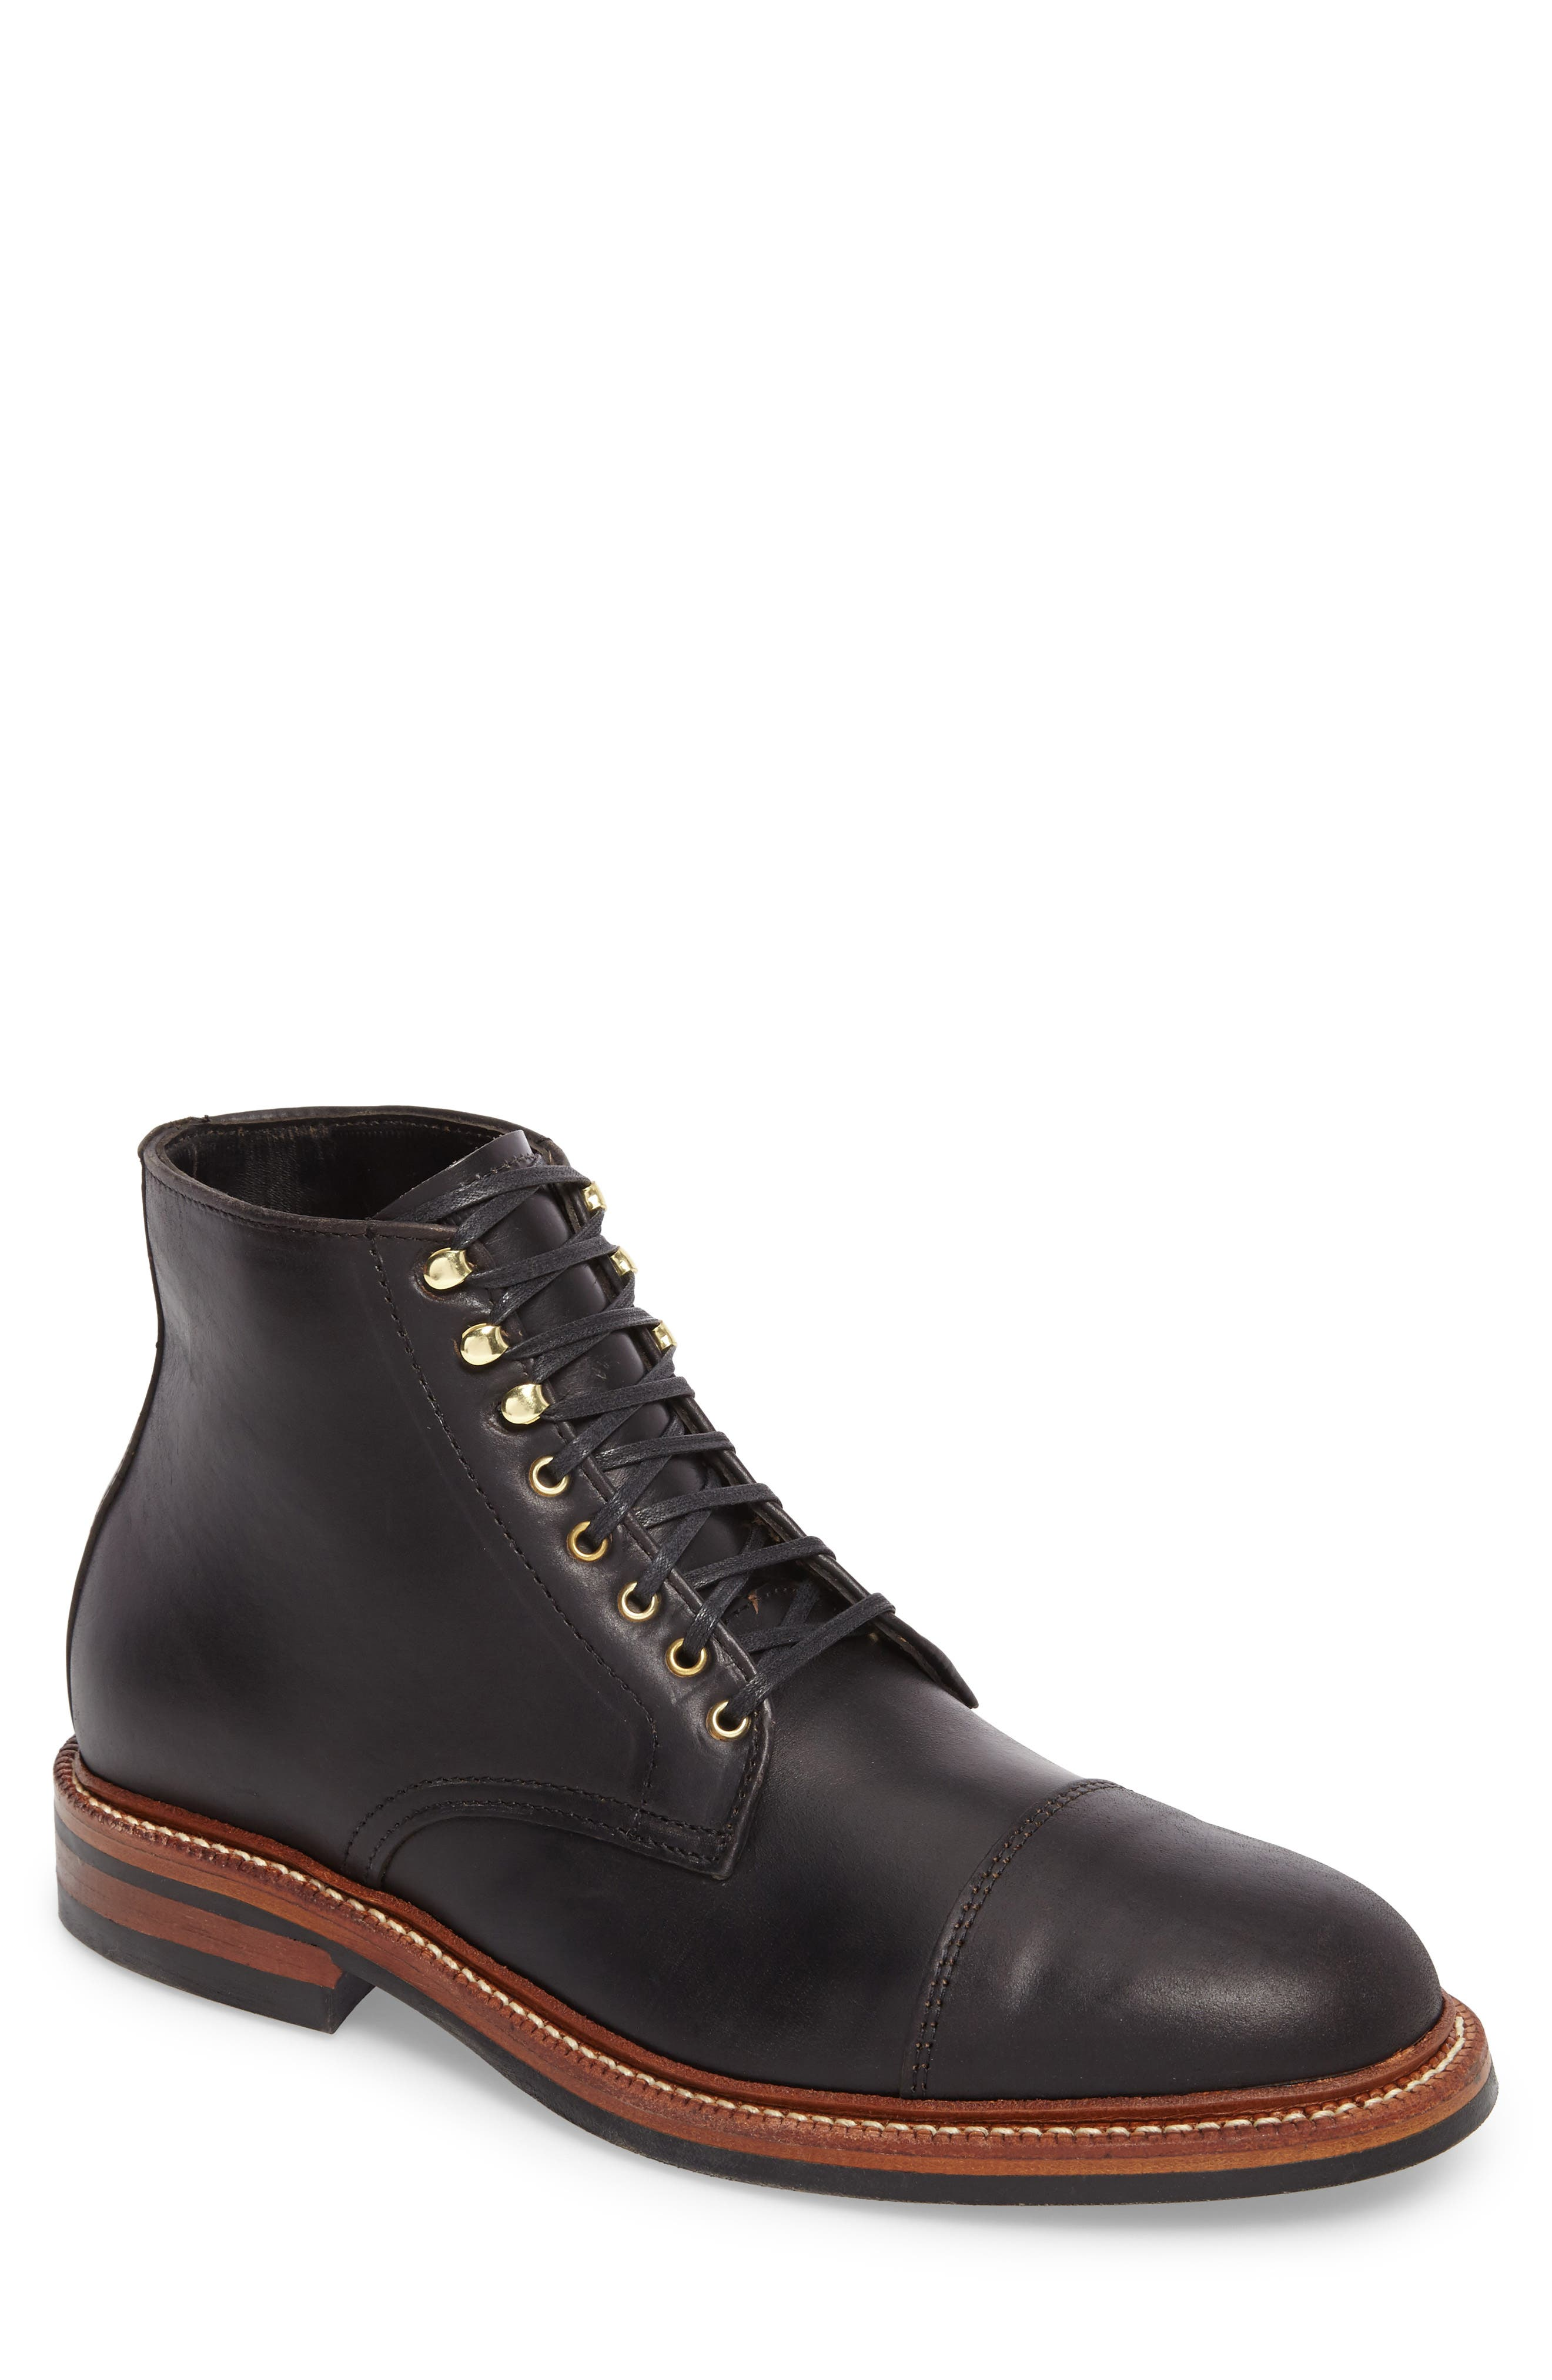 Oak Street Bootmakers Lakeshore Cap Toe Boot (Men)